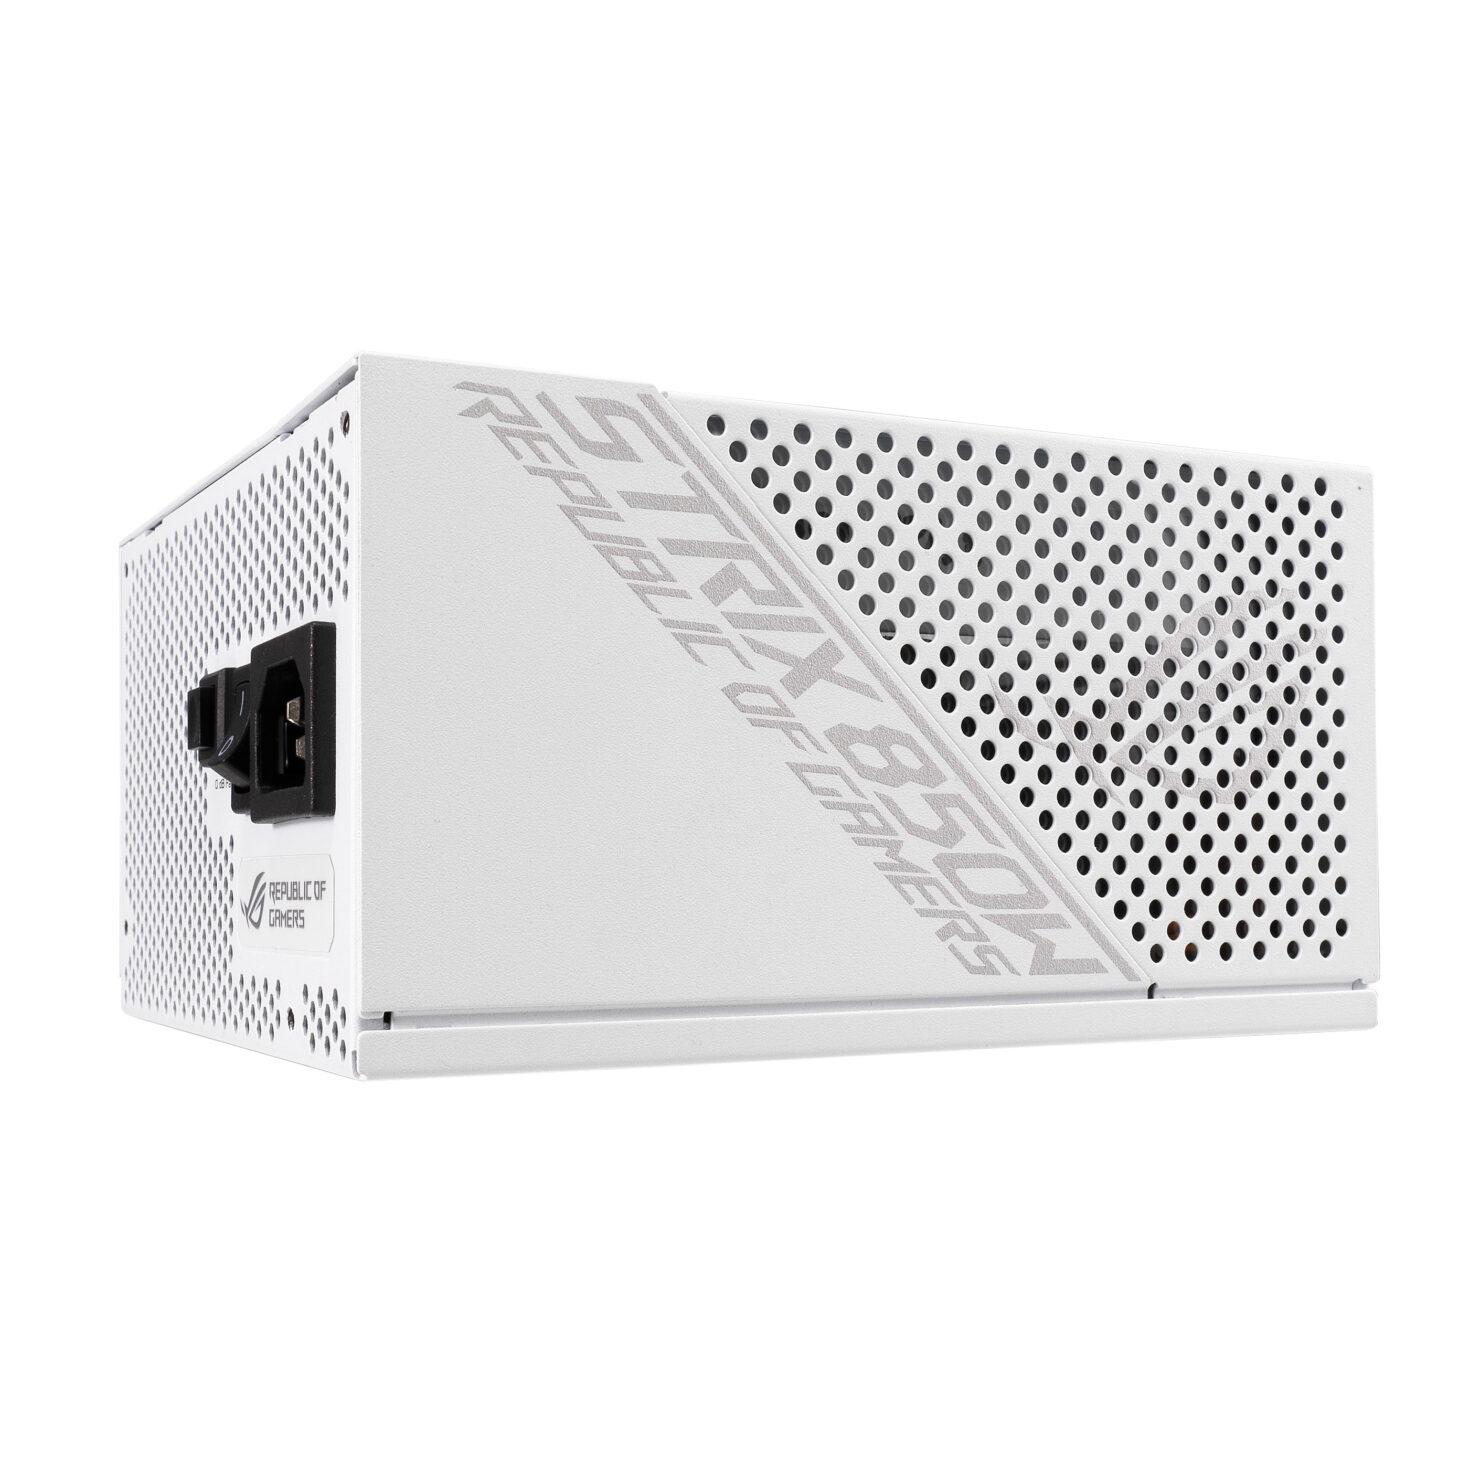 rog-strix-850w-white-edition_4